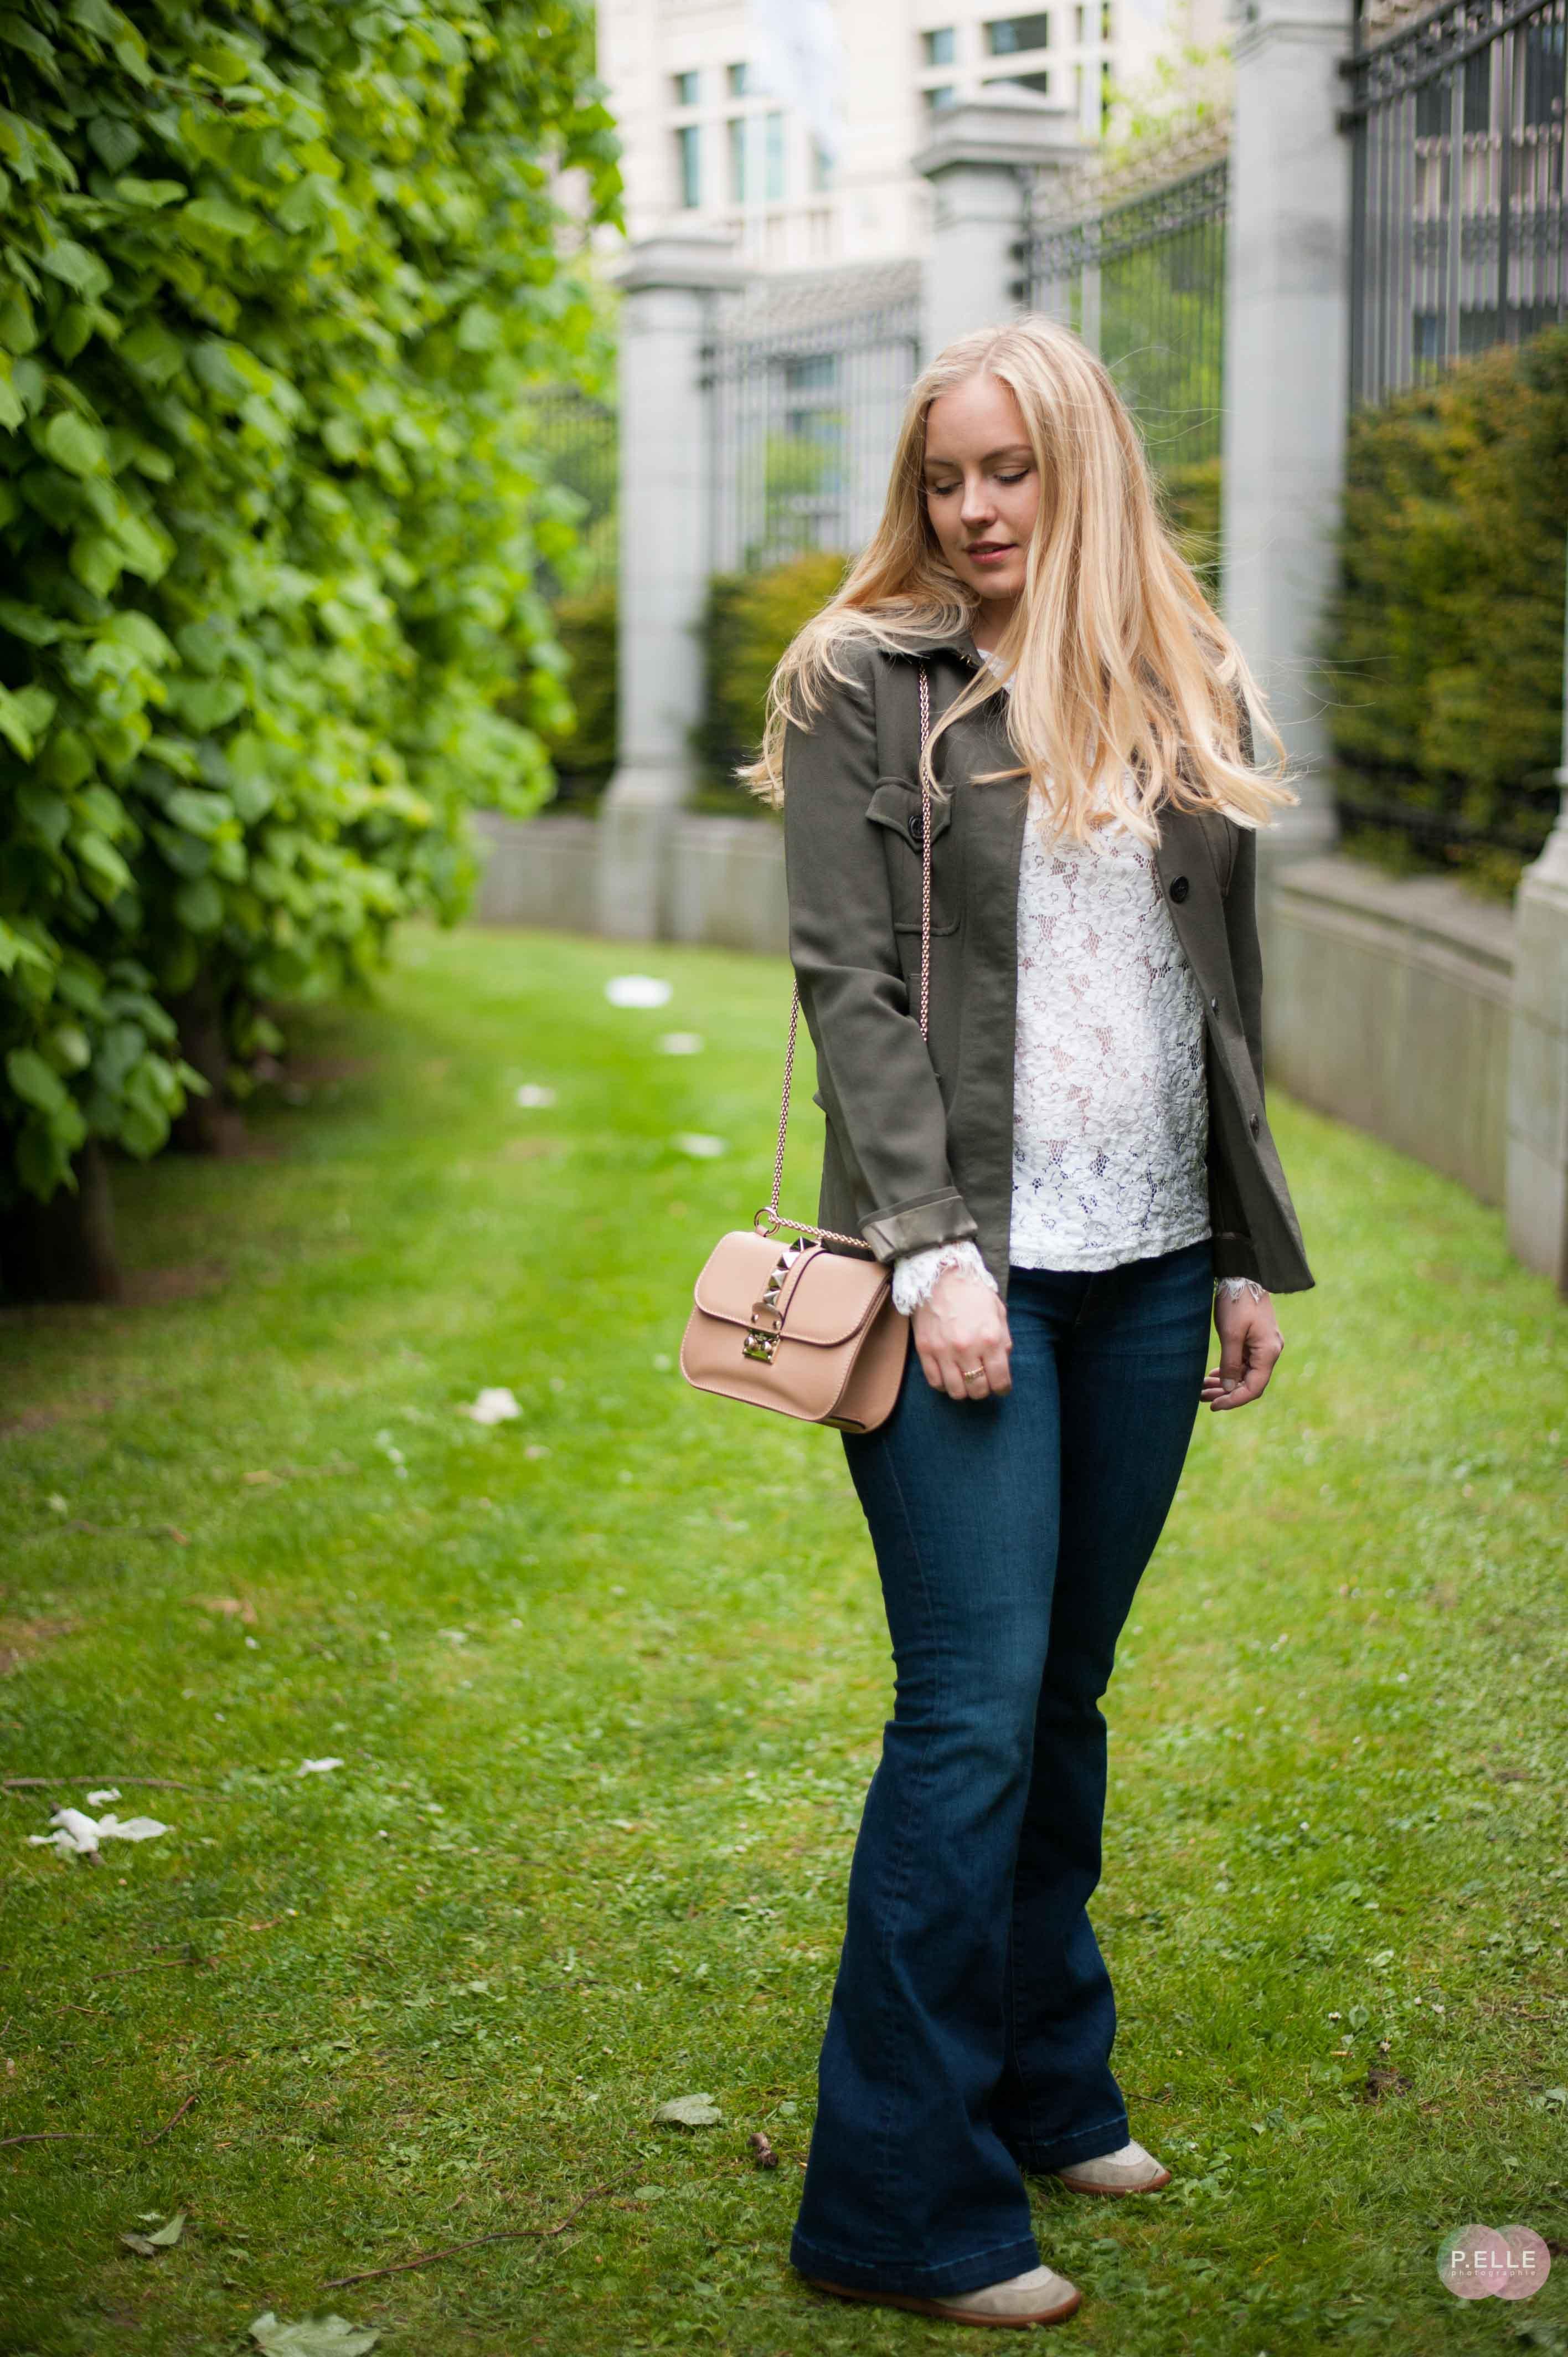 Chanel brooch & Valentino bag